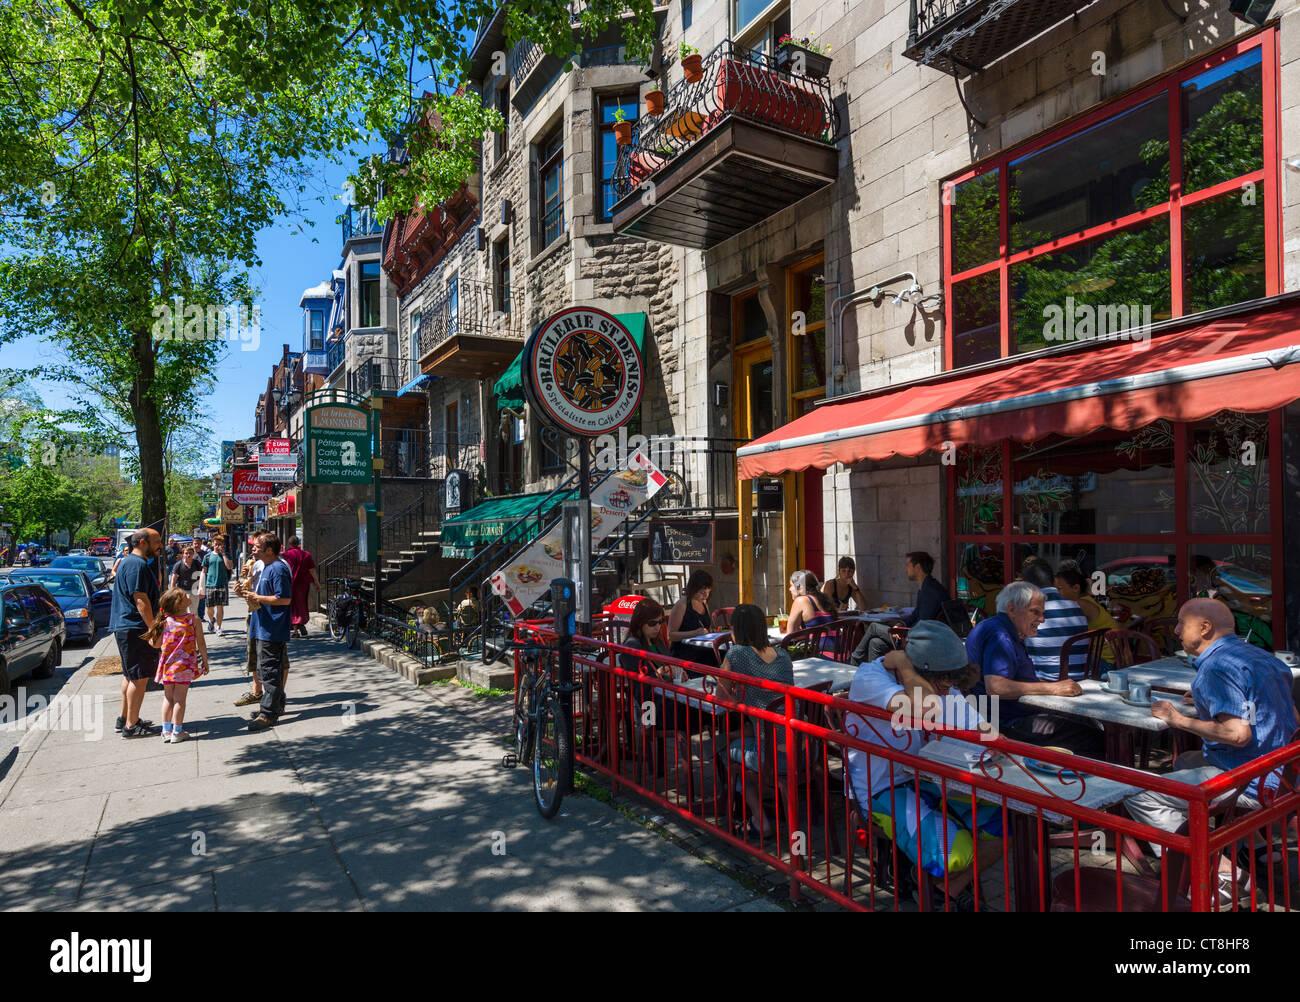 bars cafes and restaurants along rue saint denis in the. Black Bedroom Furniture Sets. Home Design Ideas